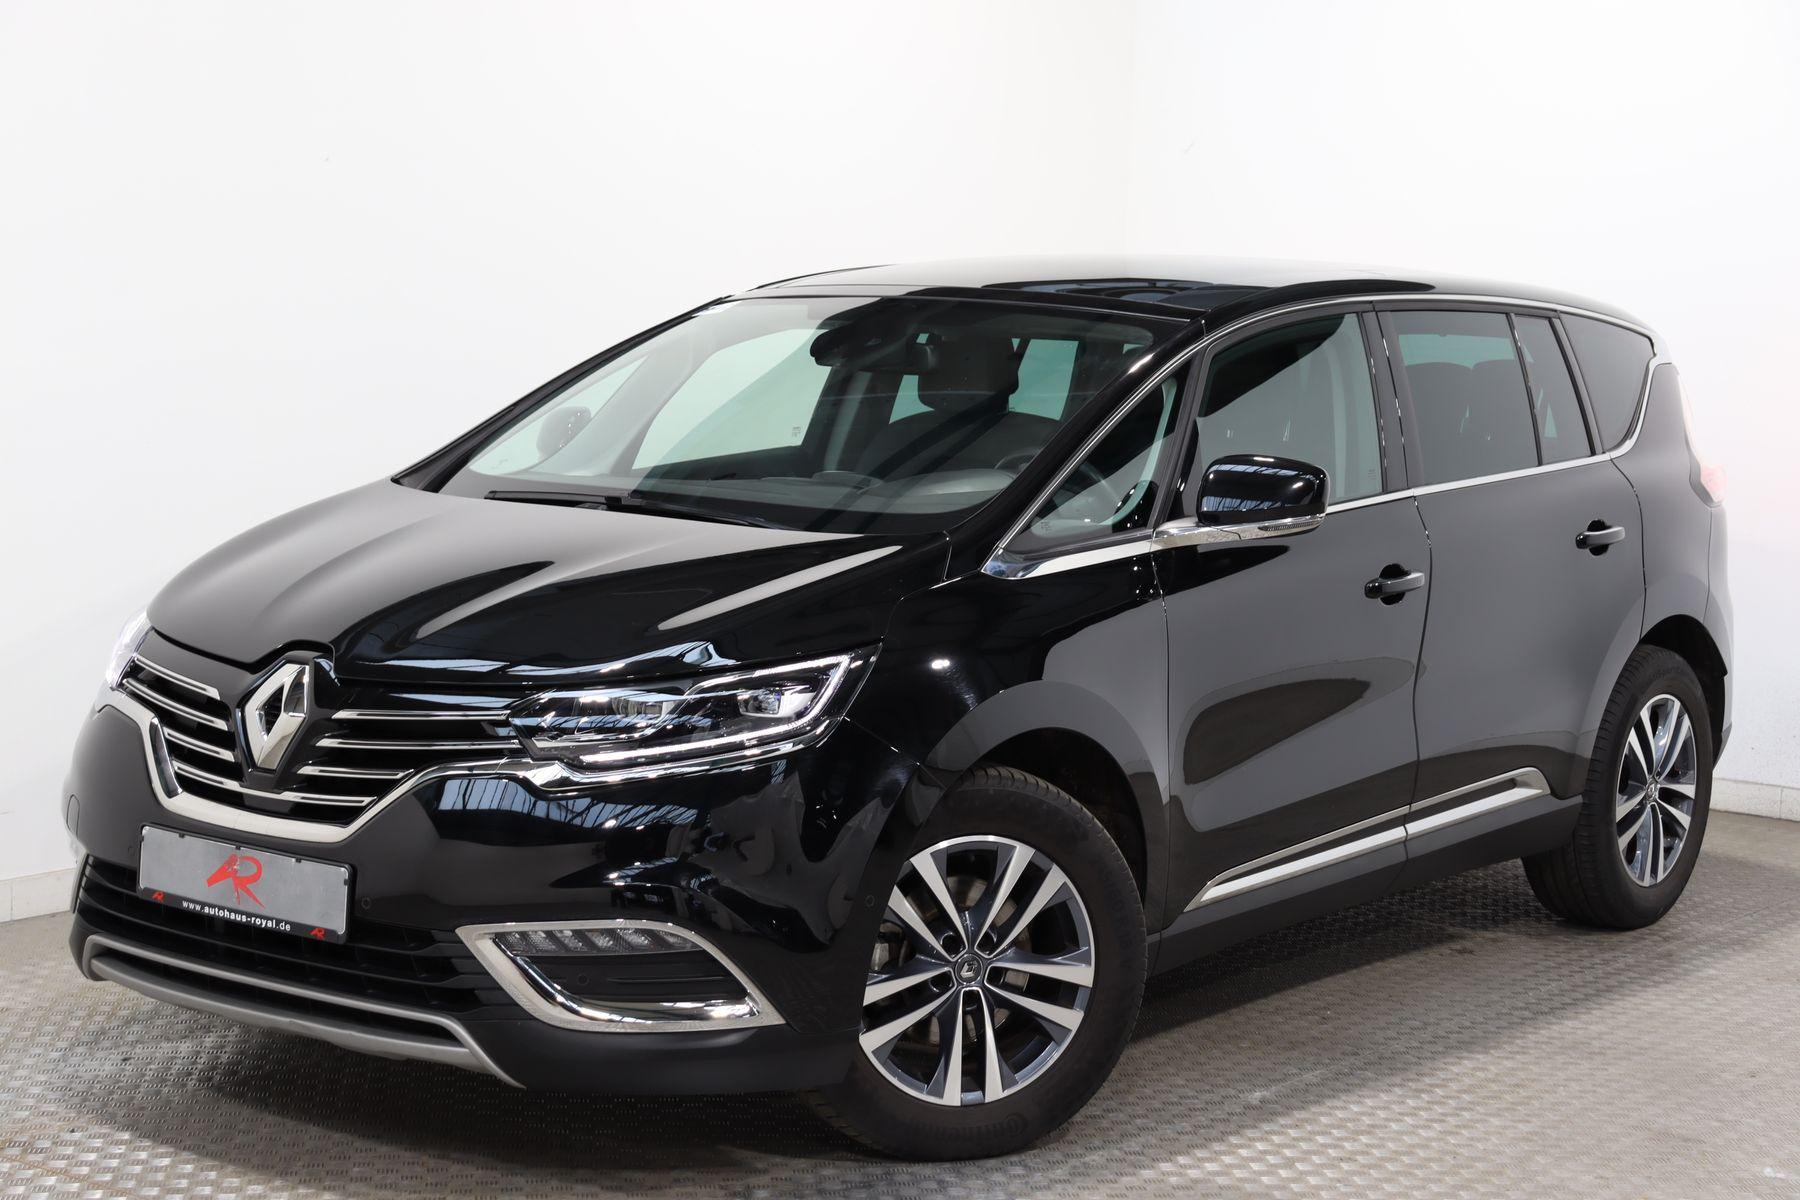 Renault Espace 1.3 dCi 7 SITZE DIG.TACHO,360GRAD,PANO,SH, Jahr 2018, Diesel